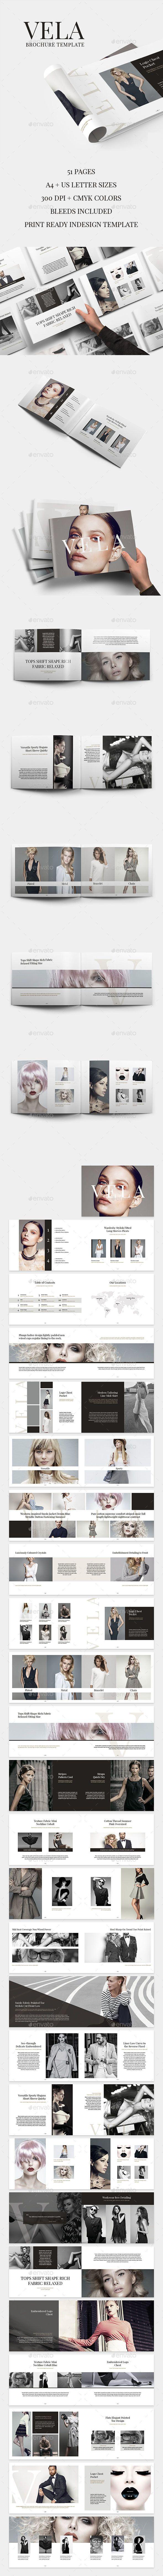 Vela brochure template u indesign indd catalogue business